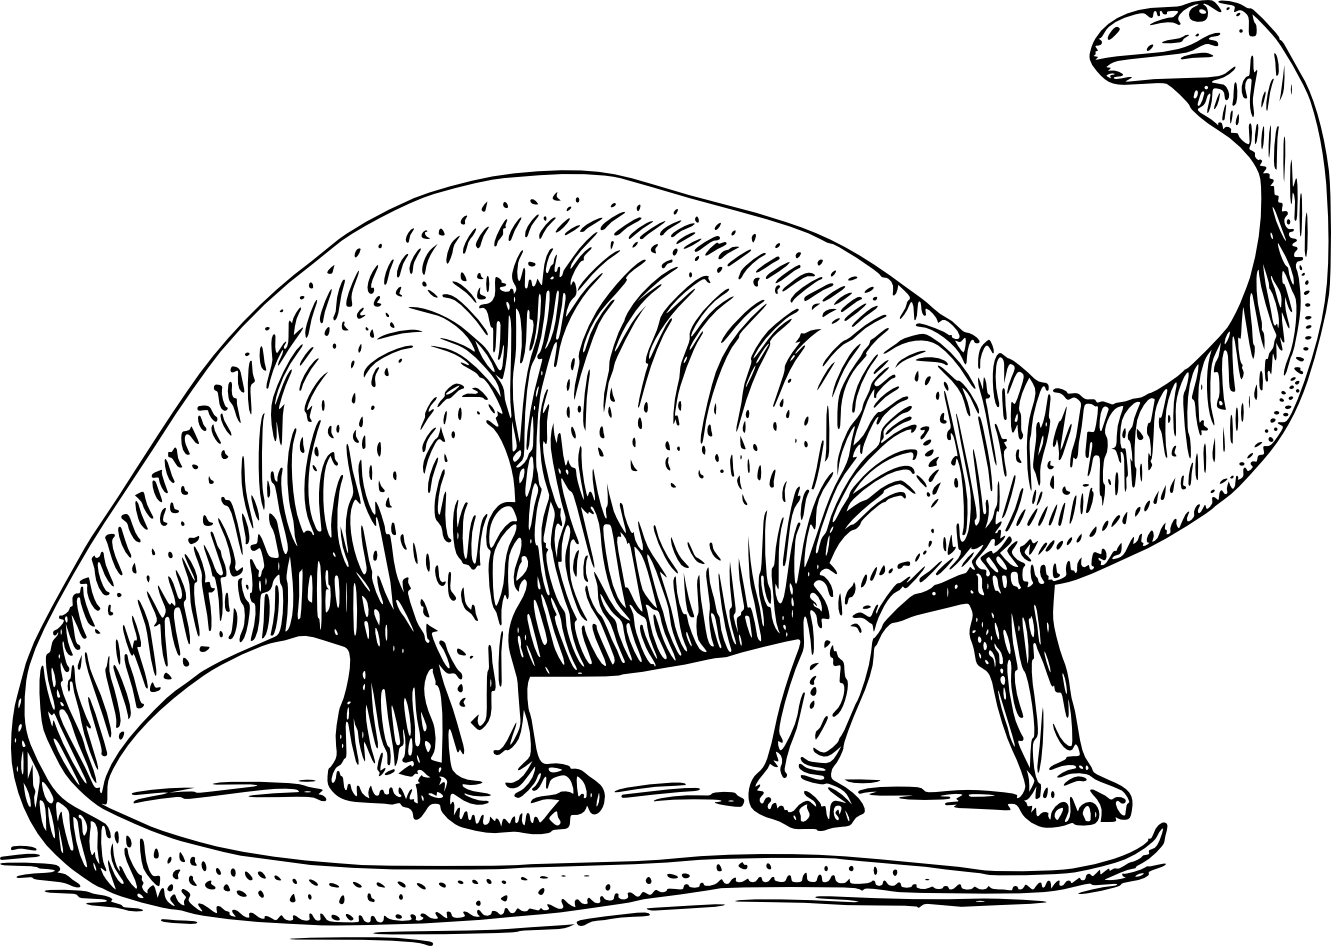 Dinosaur clipart dinosaur skeleton.  collection of black